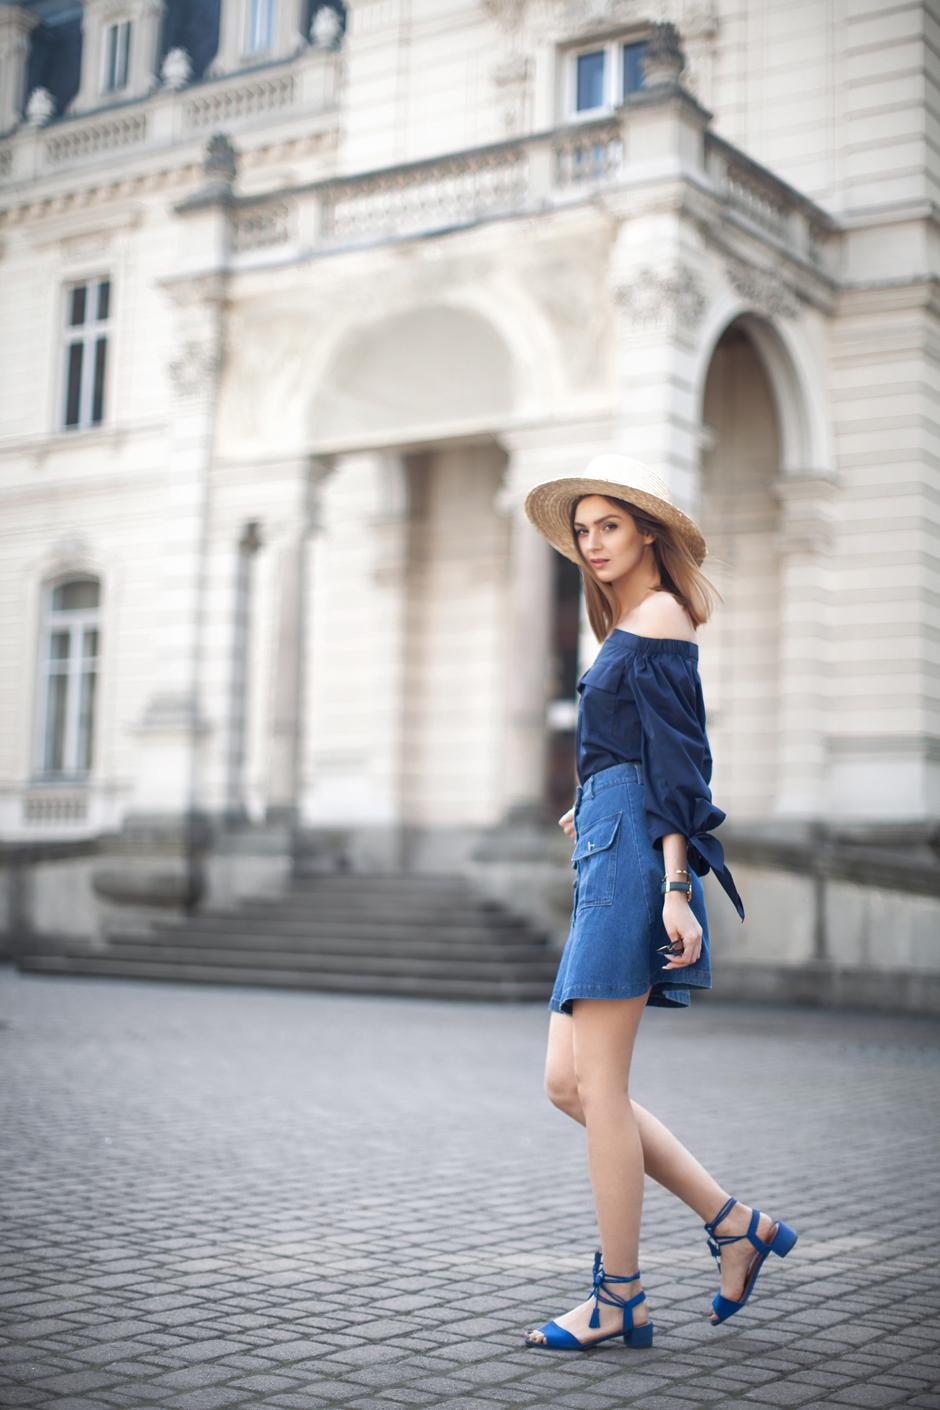 49d8da02a862b denim-skirt-outfit-off-shoulder-top-lace-up- ...